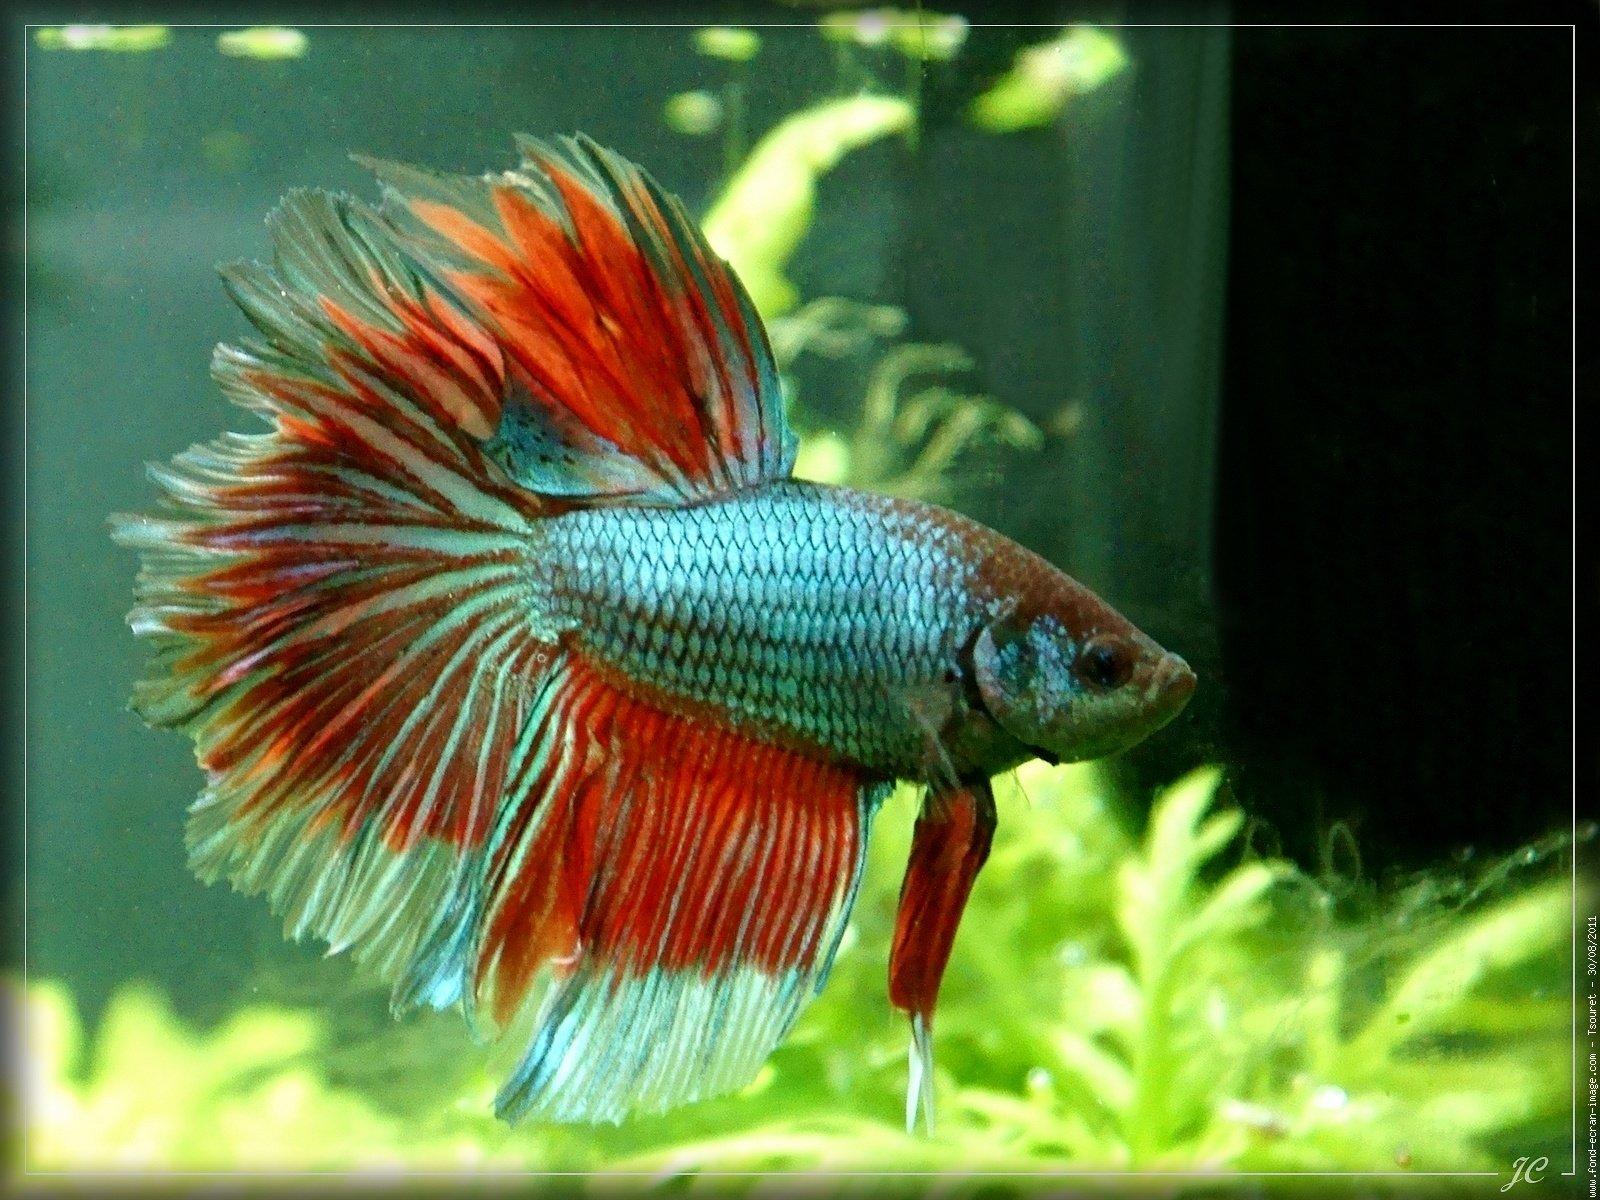 3d Fish Wallpaper Hd Betta Siamese Fighting Fish Colorful Tropical Wallpaper